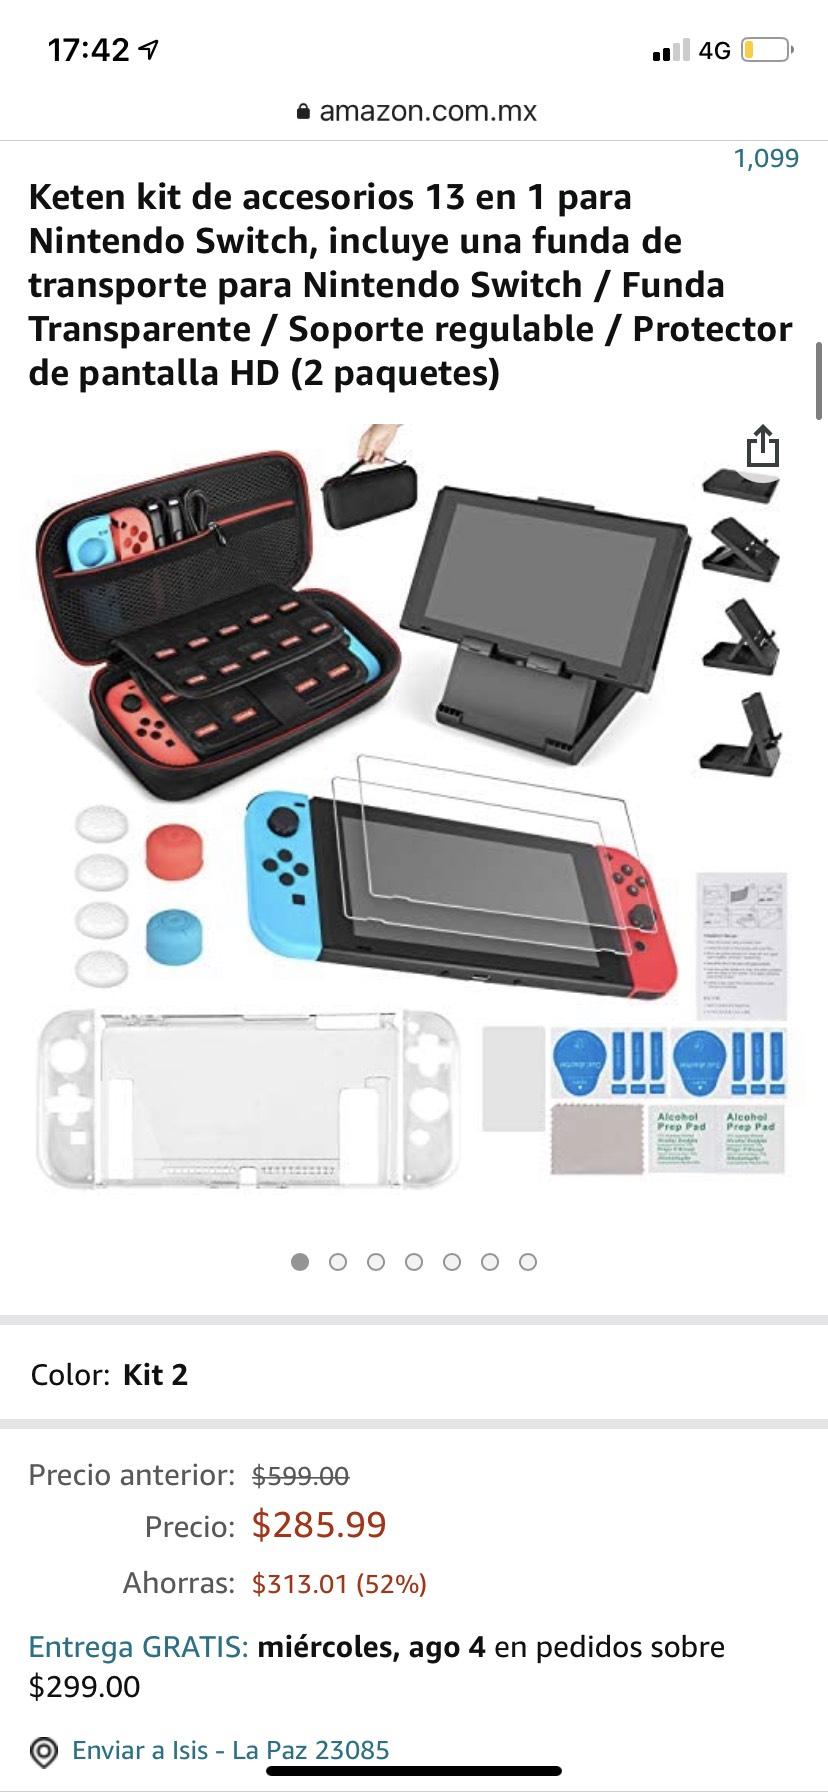 Amazon: Kit de accesorios para Nintendo Switch